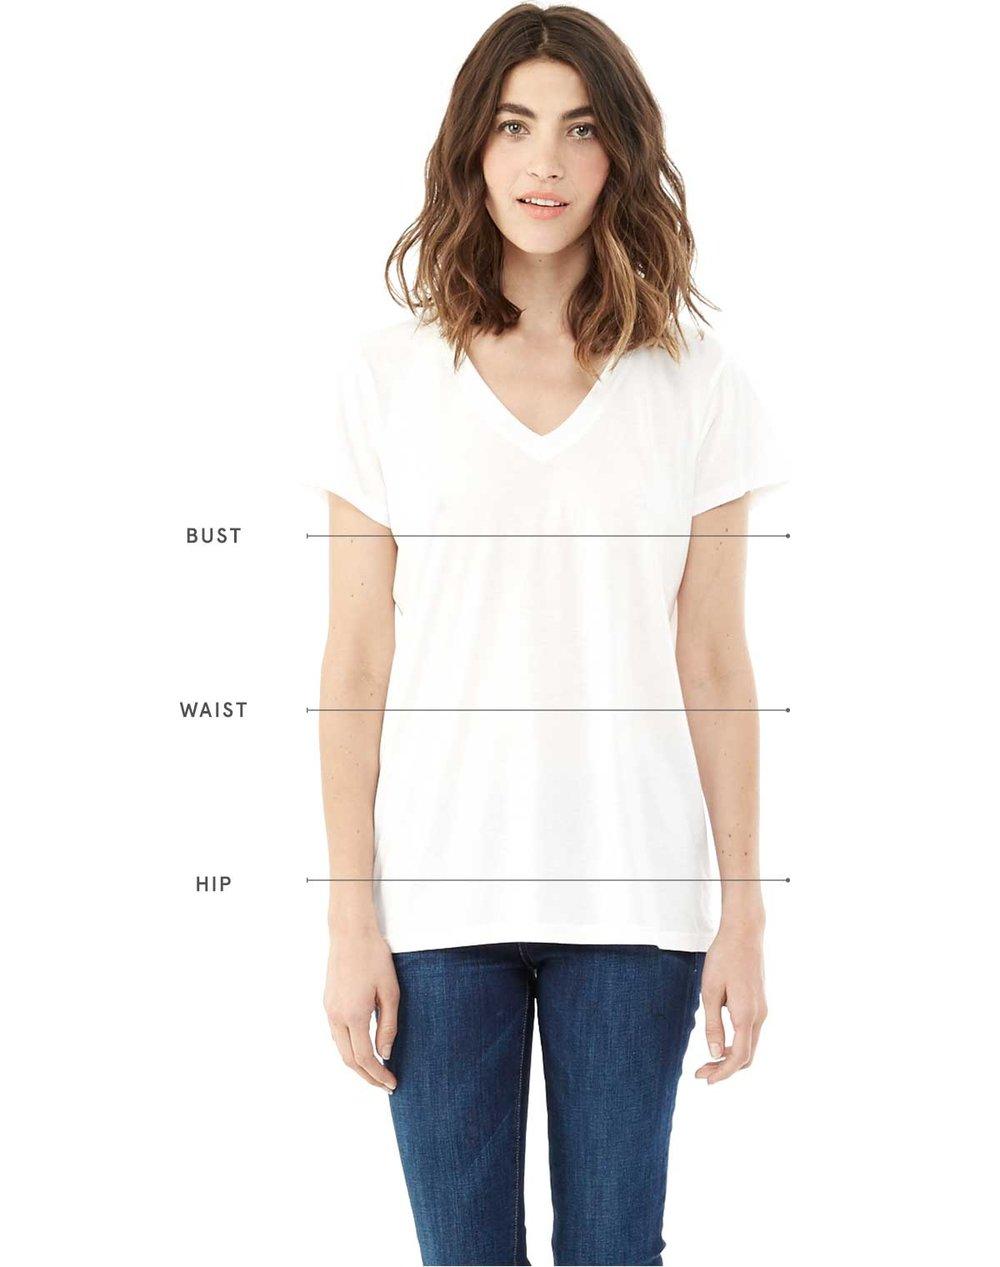 womens_size_graphic.jpg